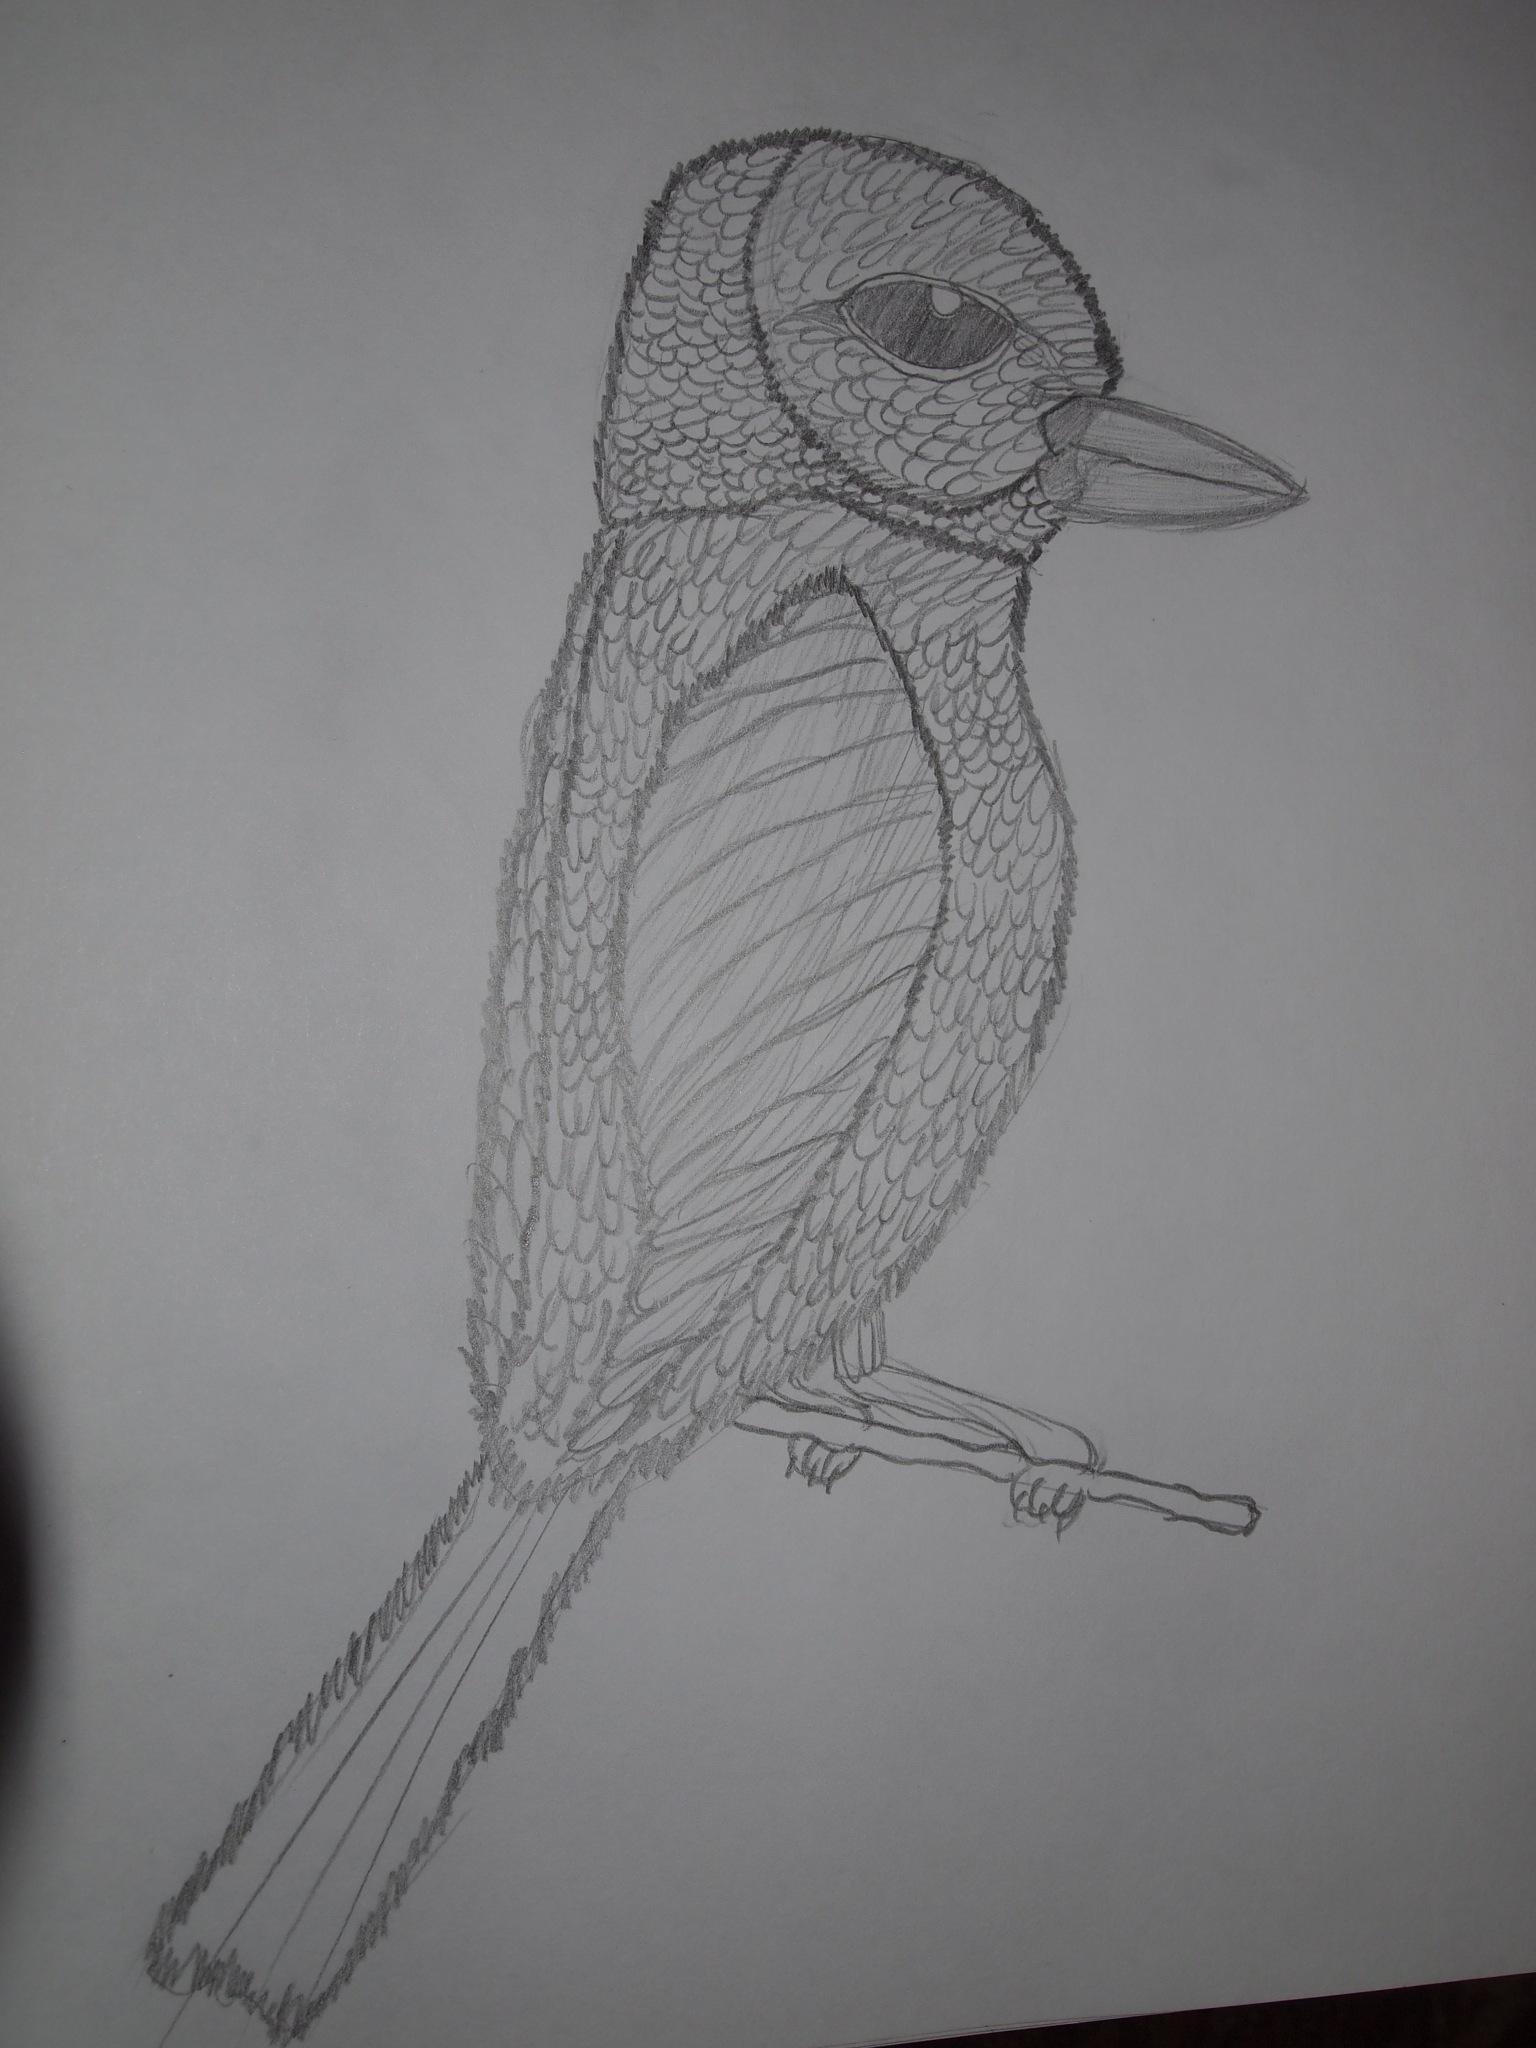 Bird Figa by Yulia2015